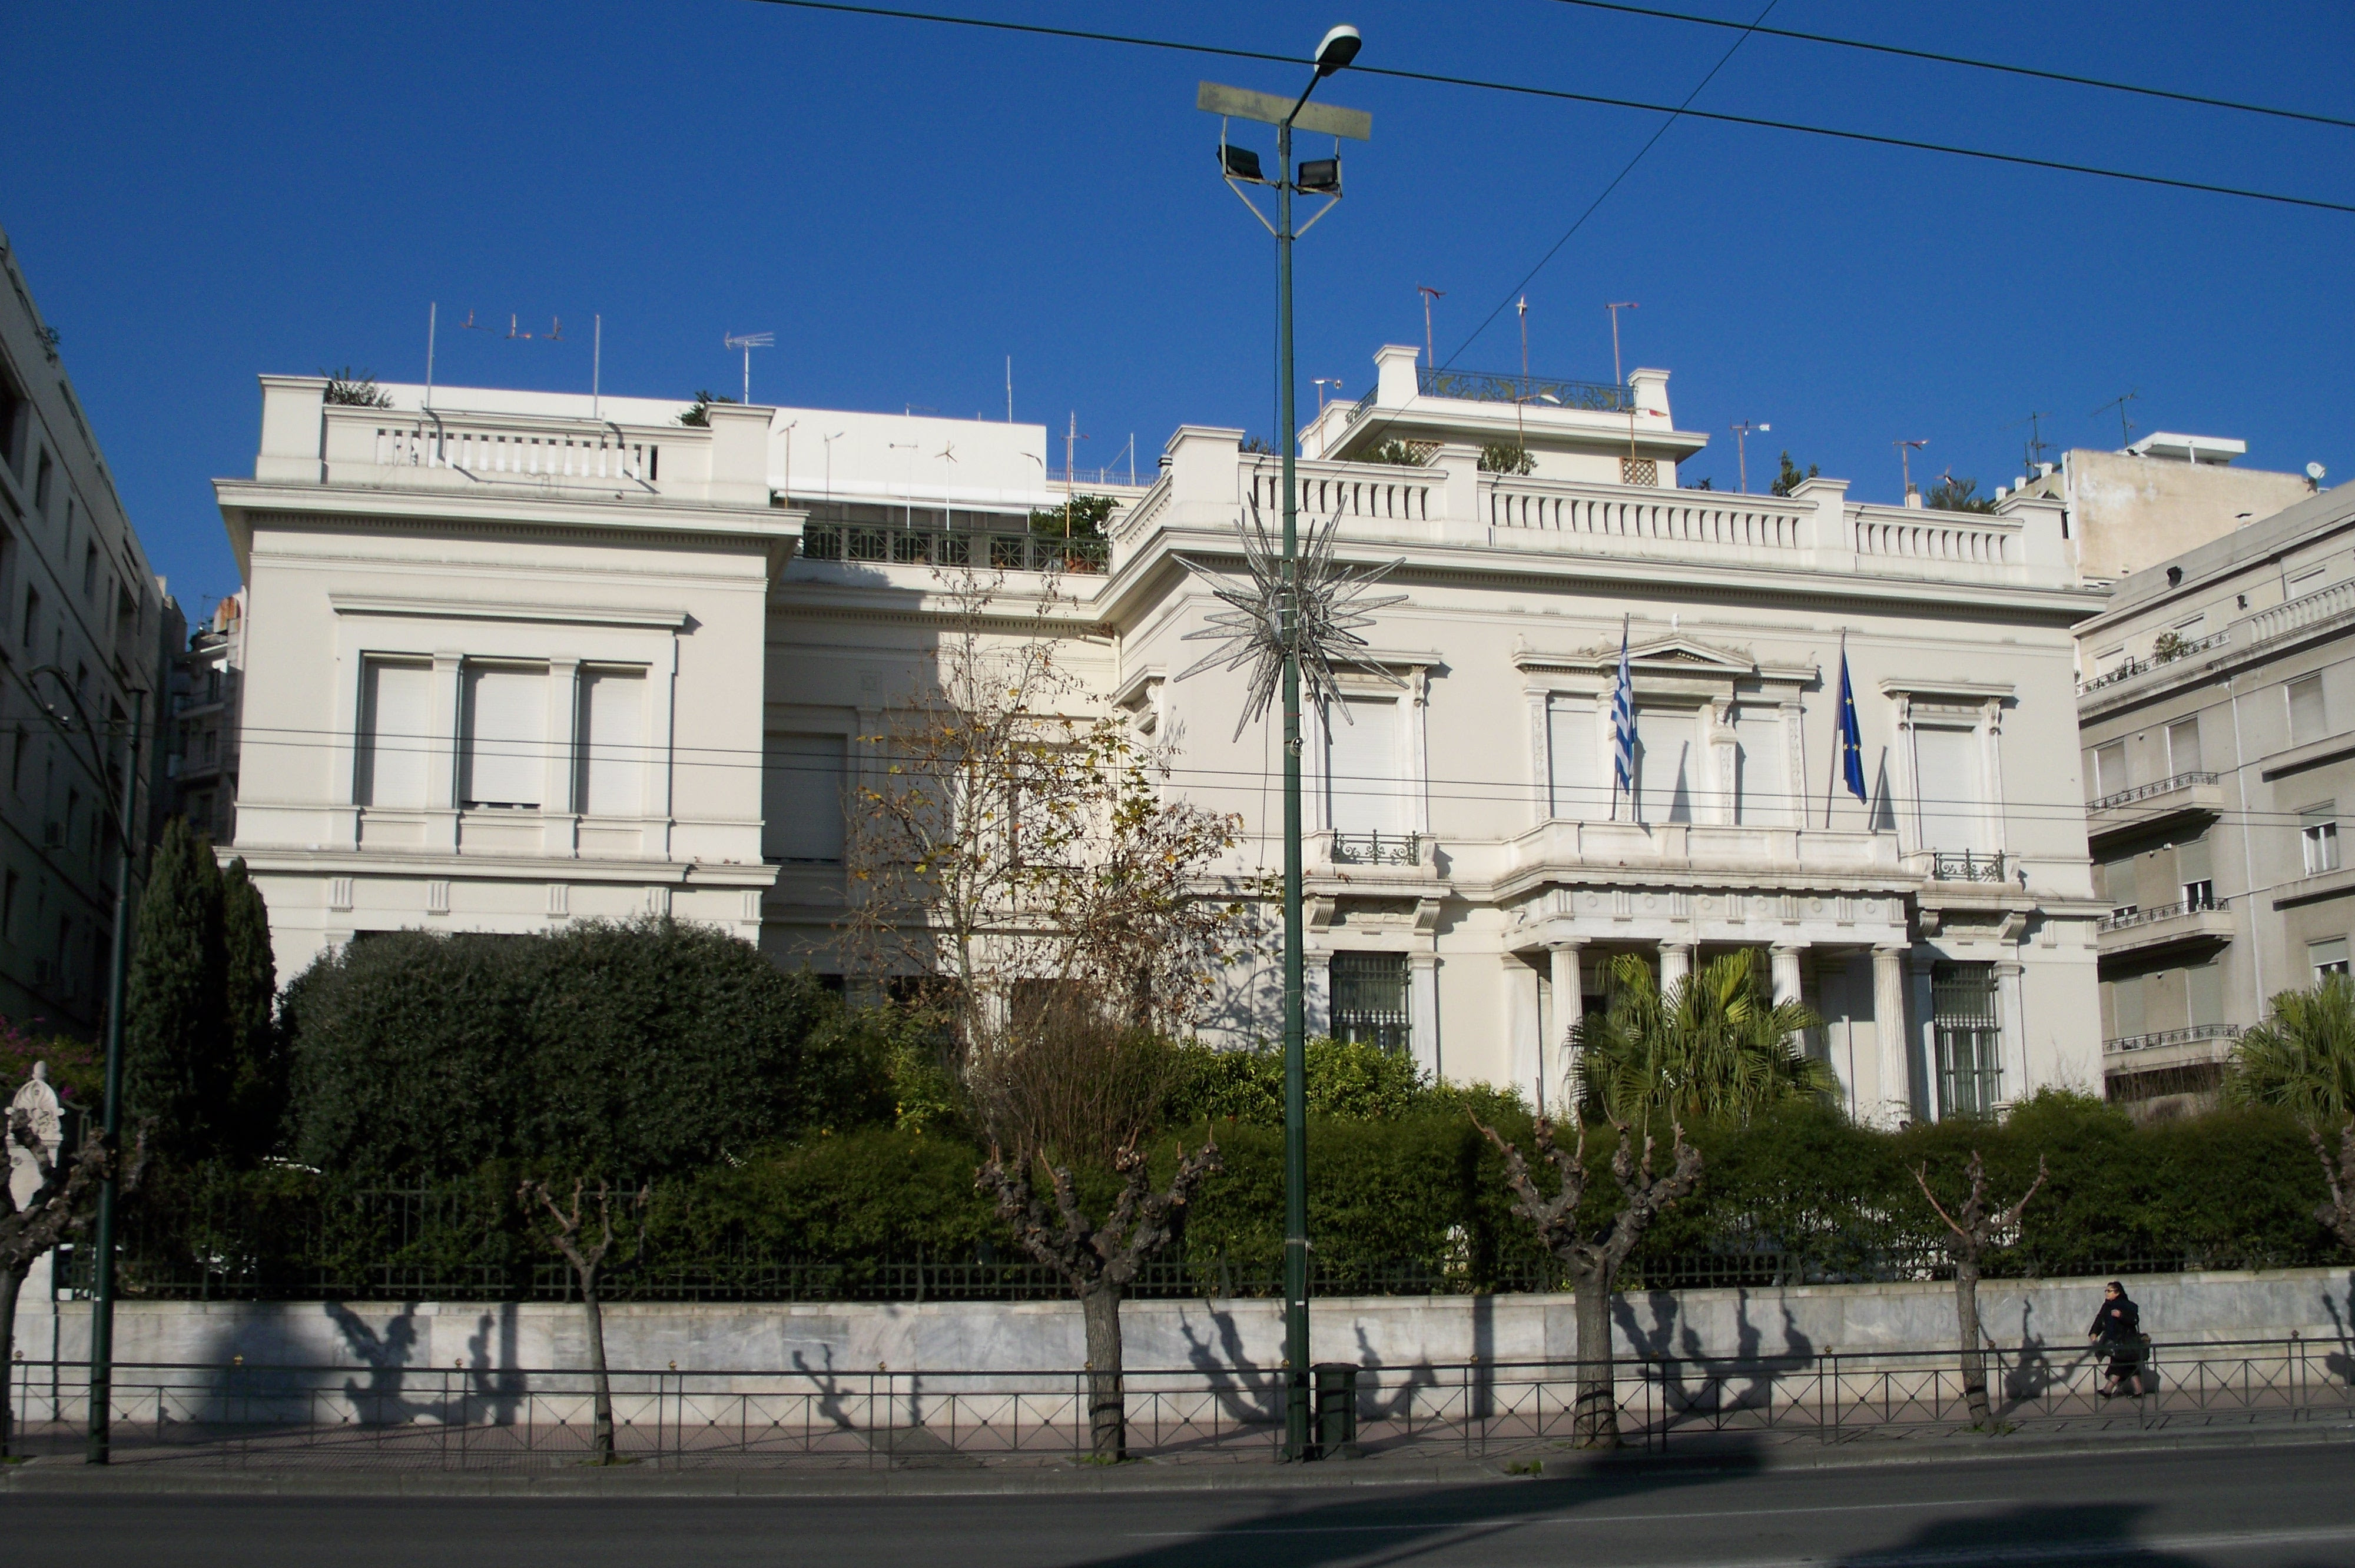 http://upload.wikimedia.org/wikipedia/commons/d/df/Benaki_Museum_Athens.JPG